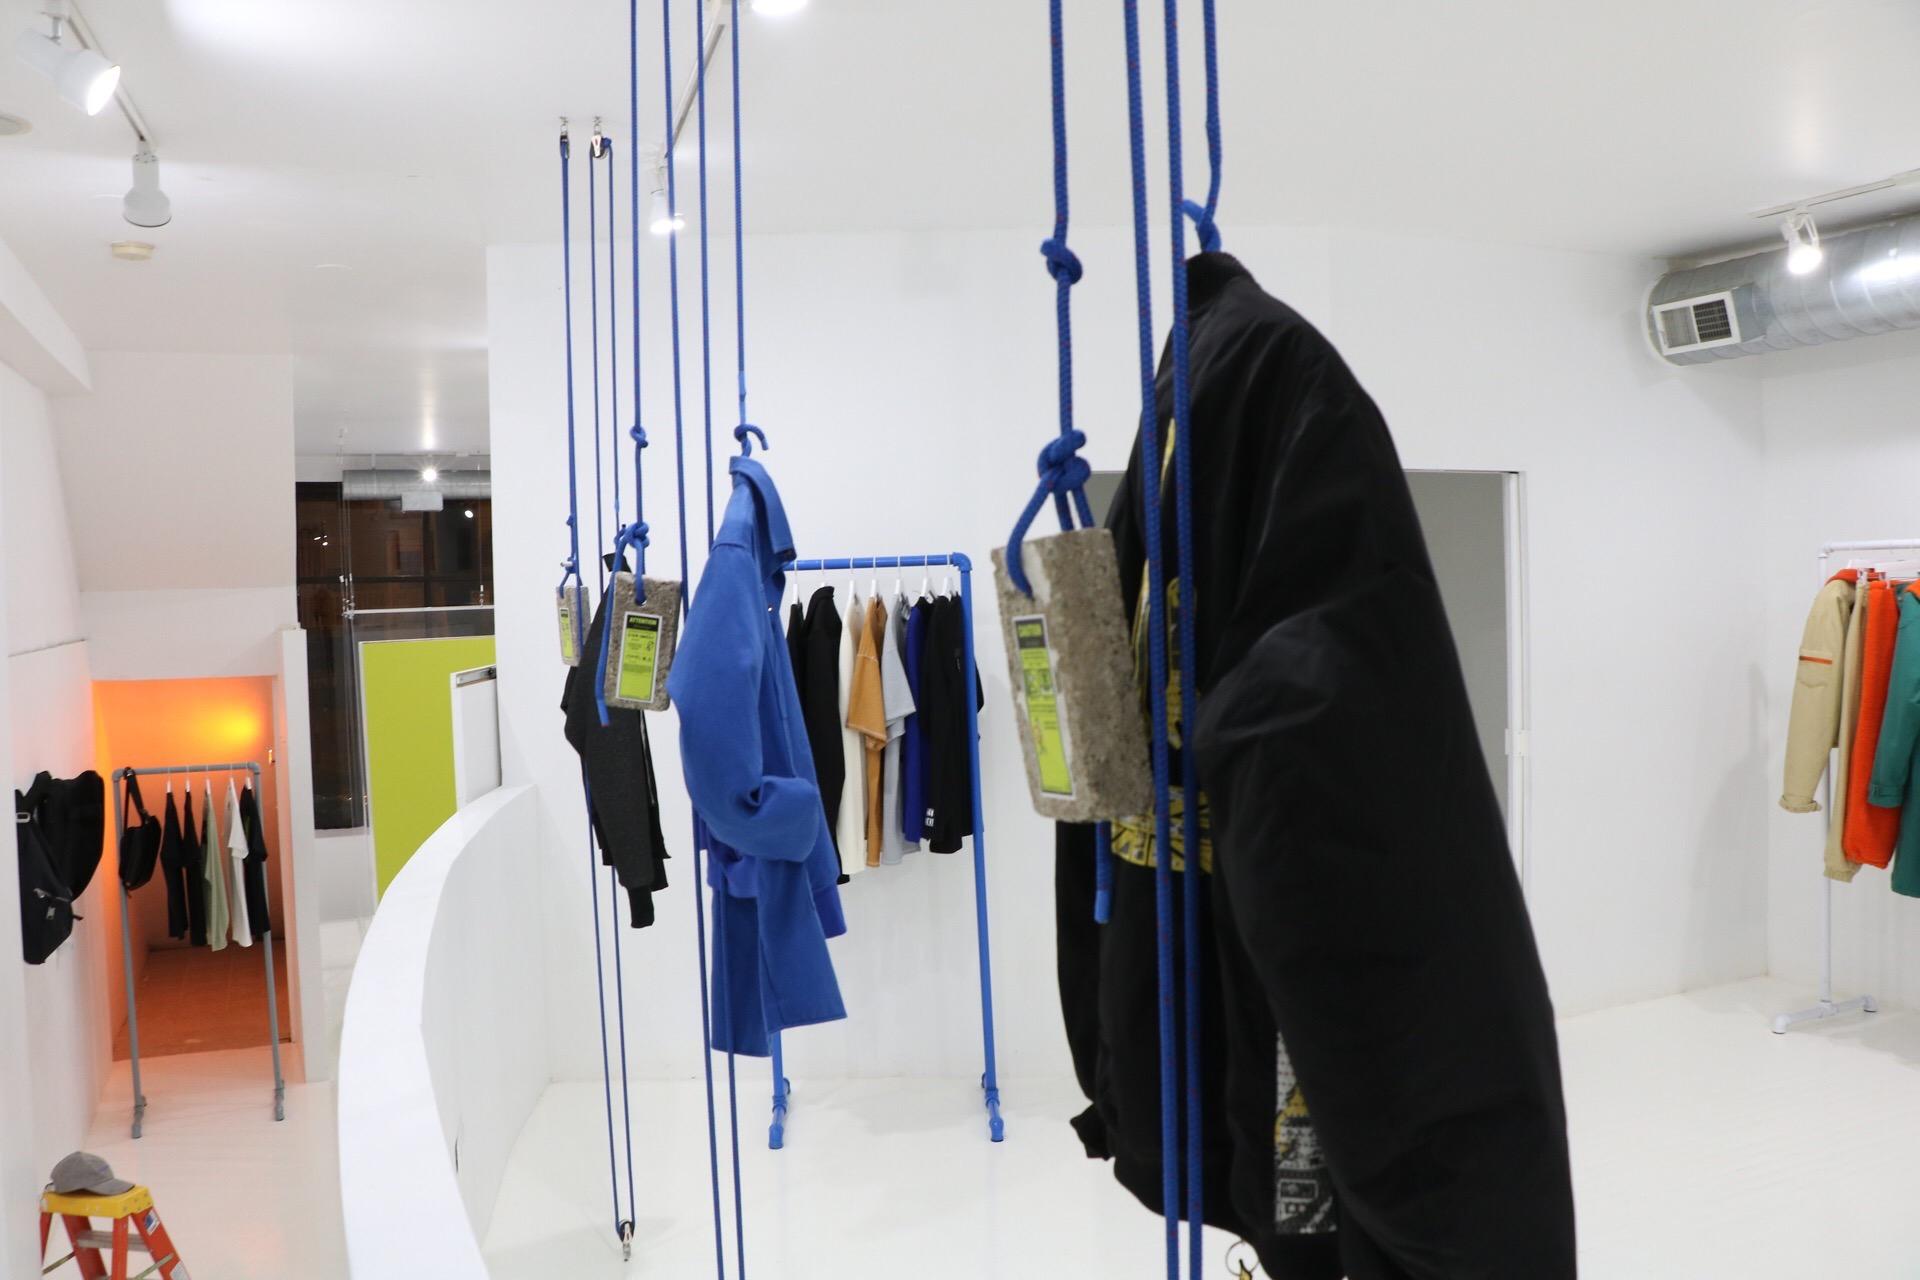 An interactive rêtail installation.